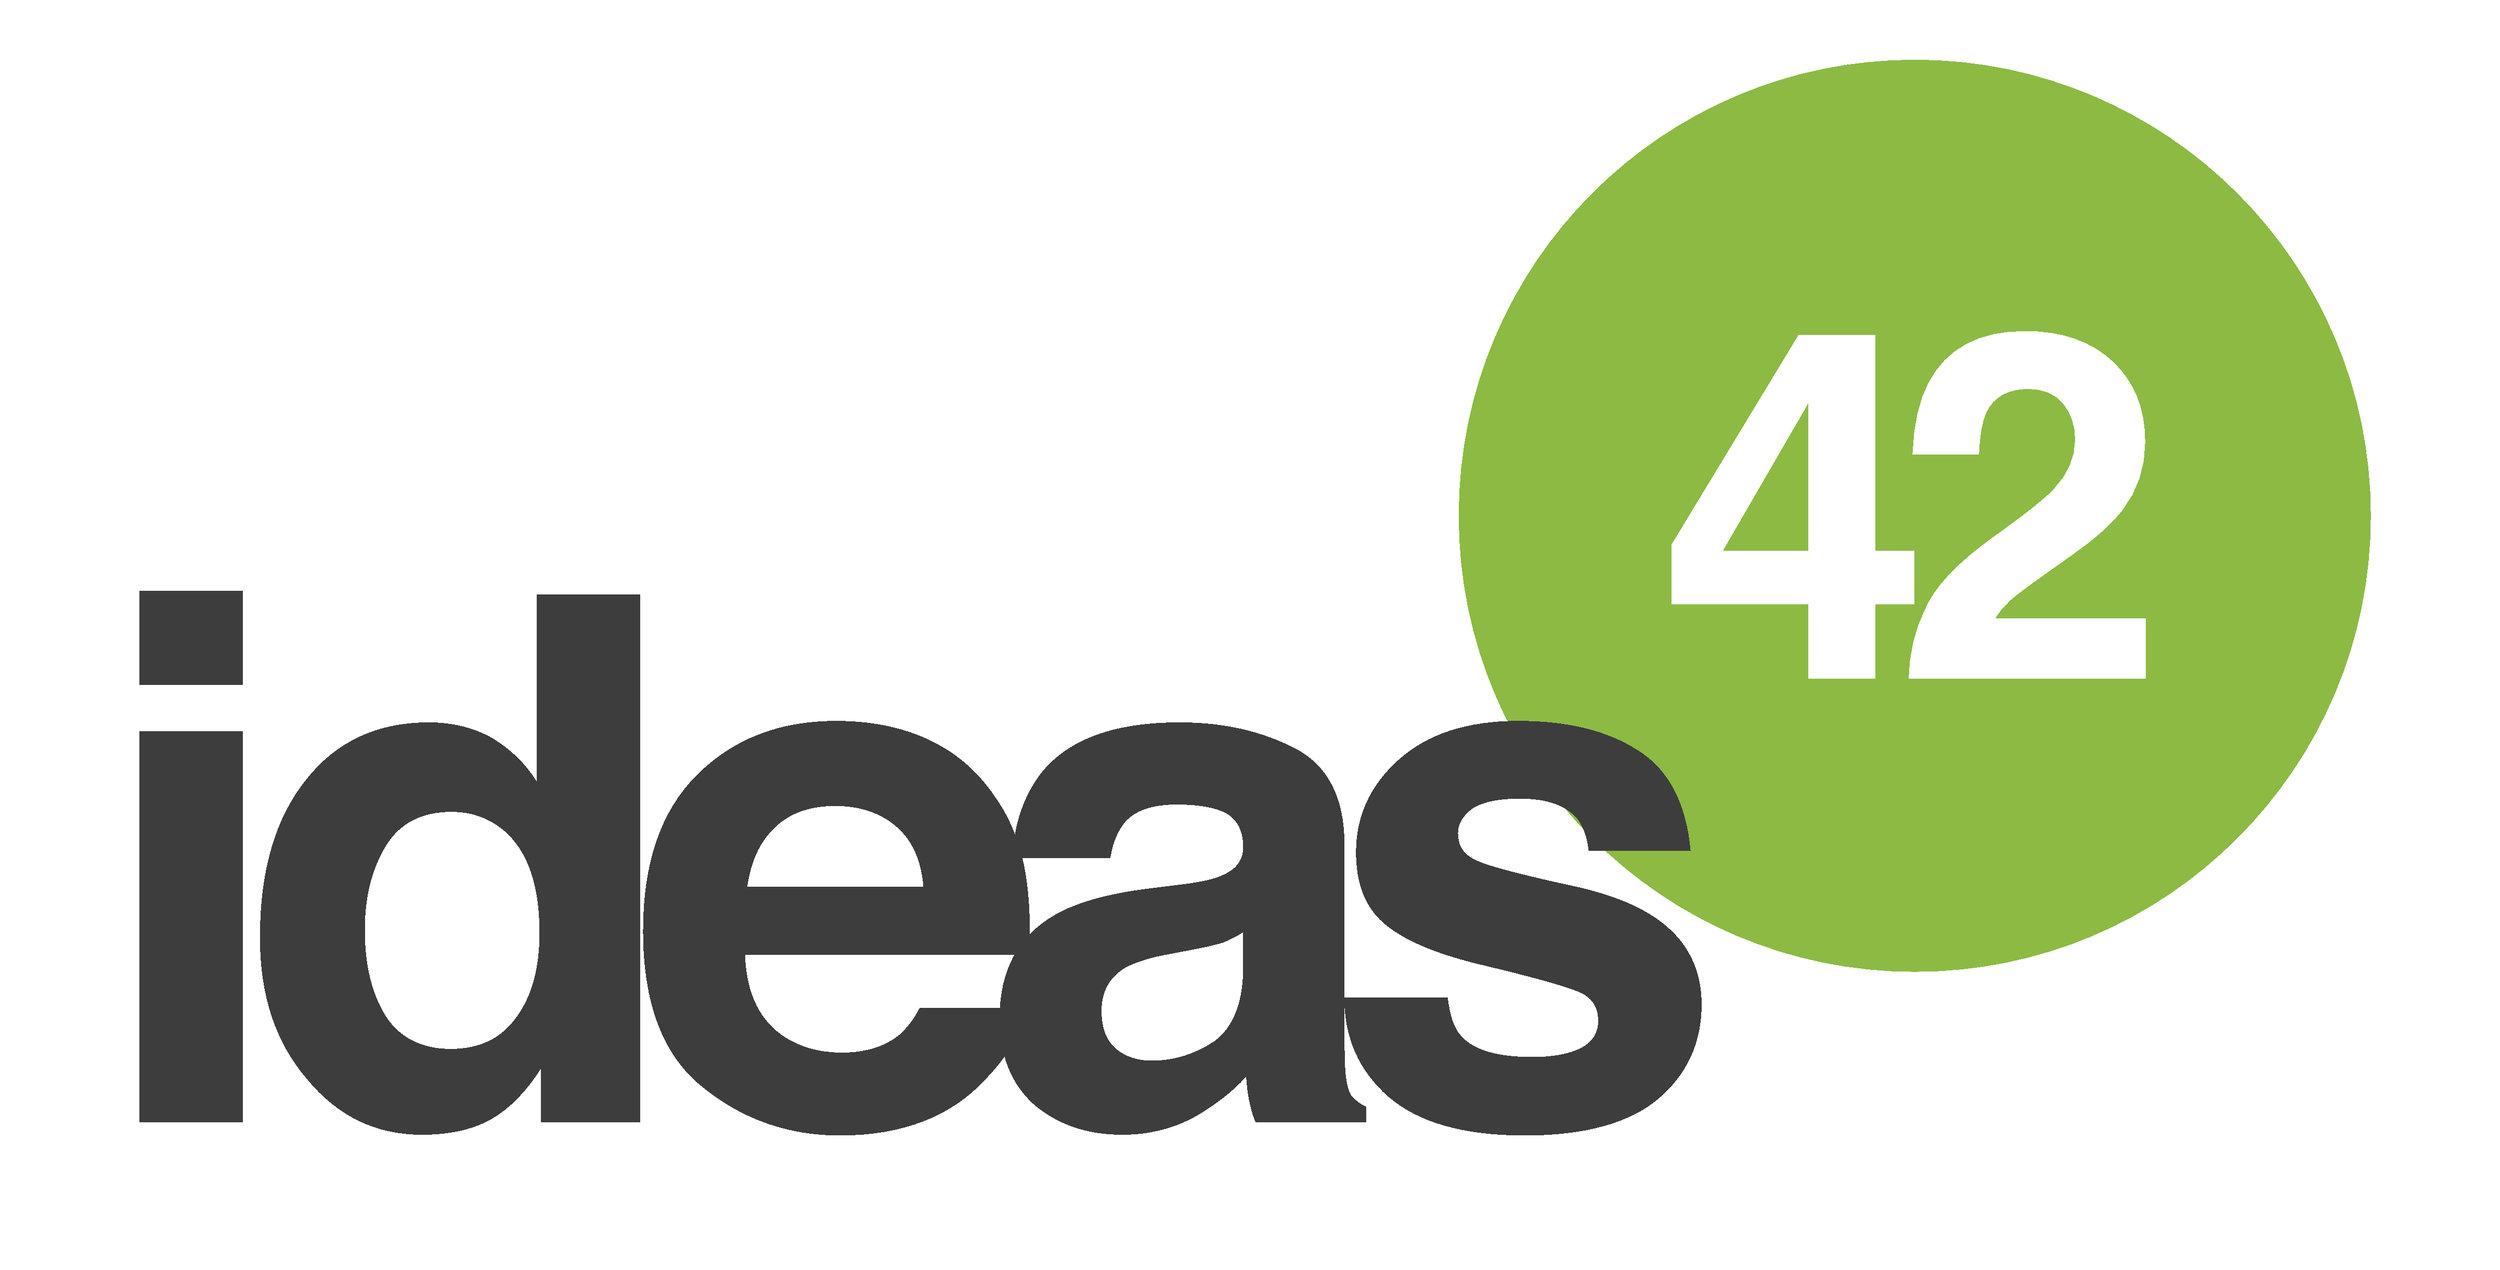 ideas42 logo_transparent (1)_0.jpg